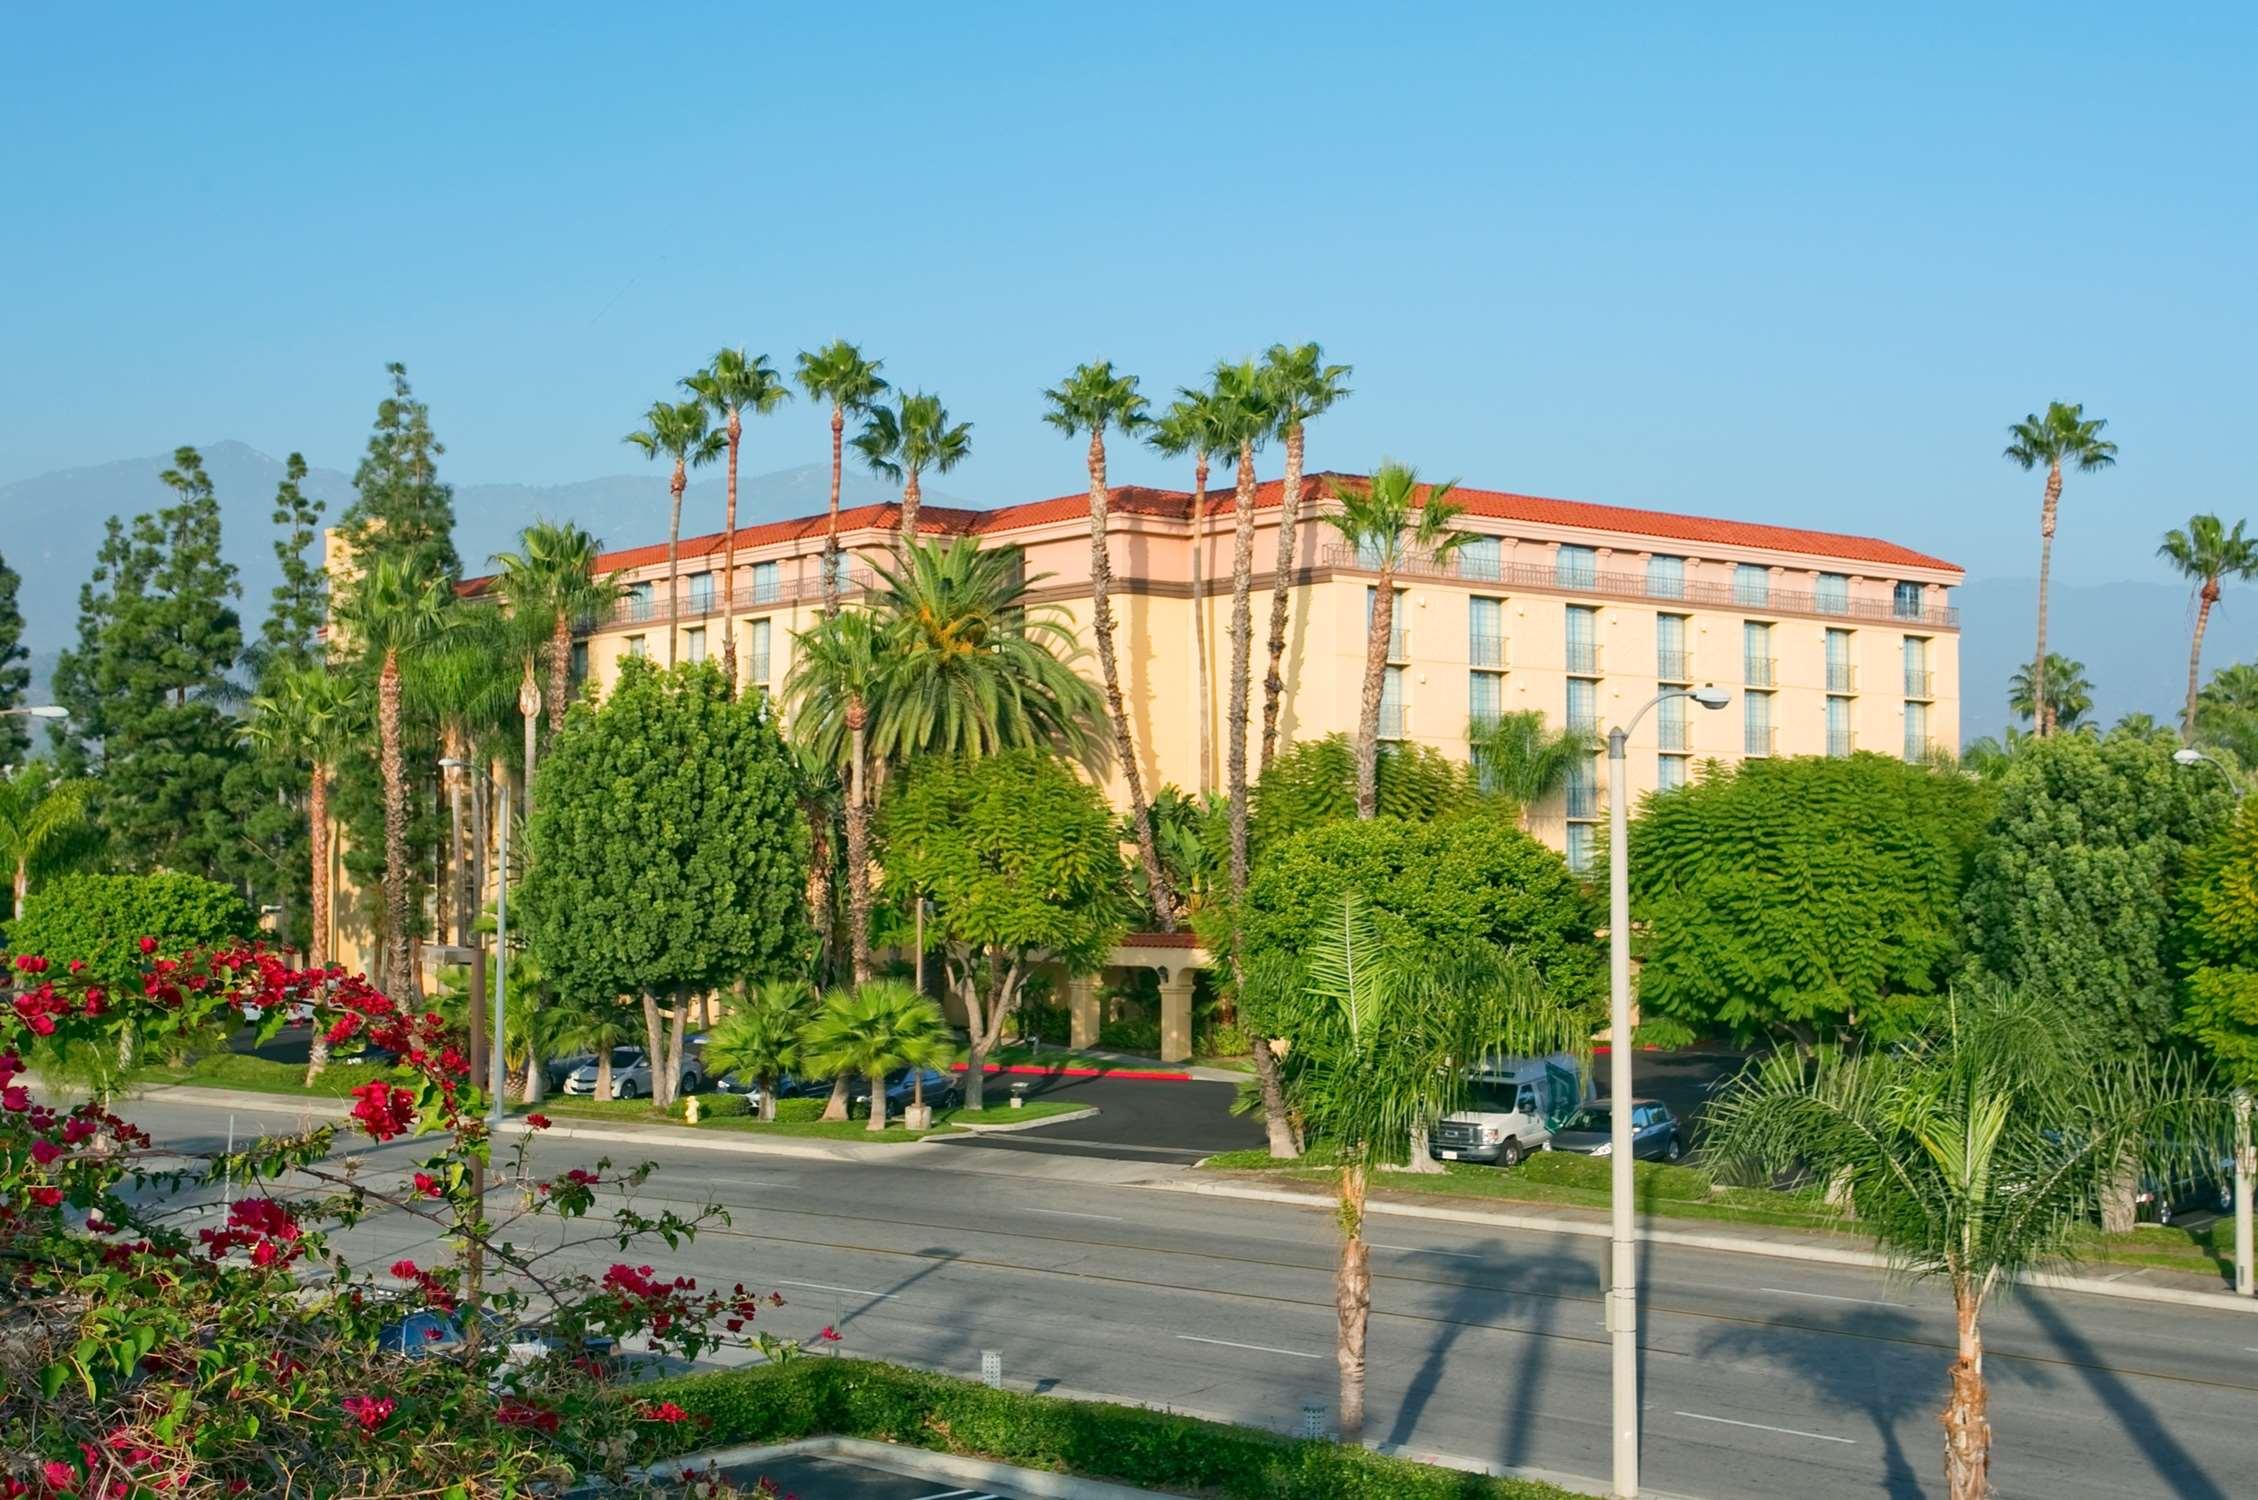 Embassy Suites by Hilton Arcadia Pasadena Area image 3